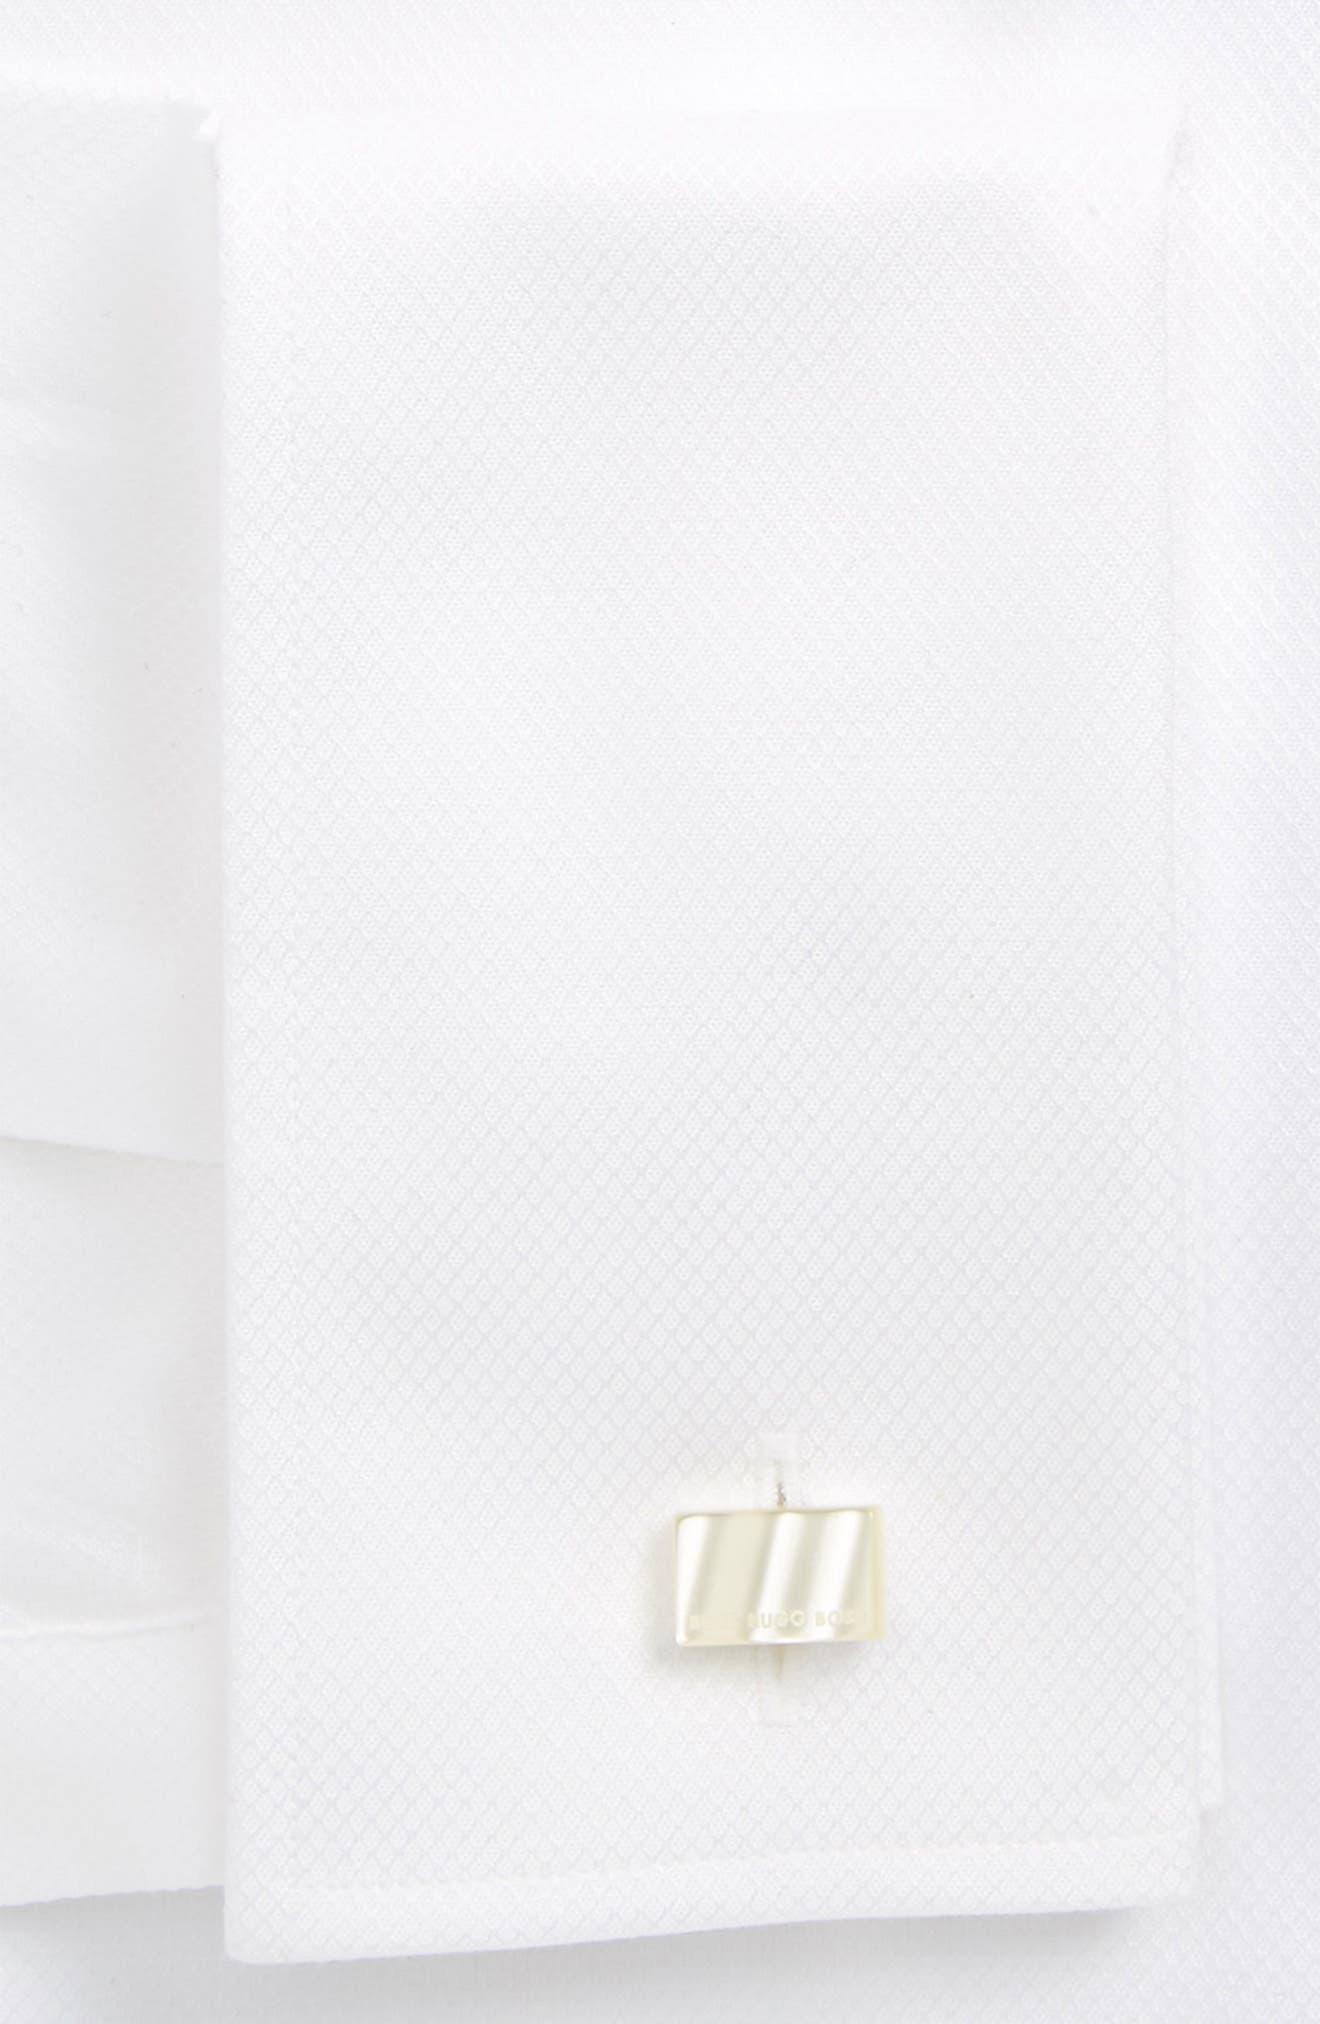 BOSS, Jameson Slim Fit Diamond Weave French Cuff Tuxedo Shirt, Alternate thumbnail 2, color, 120